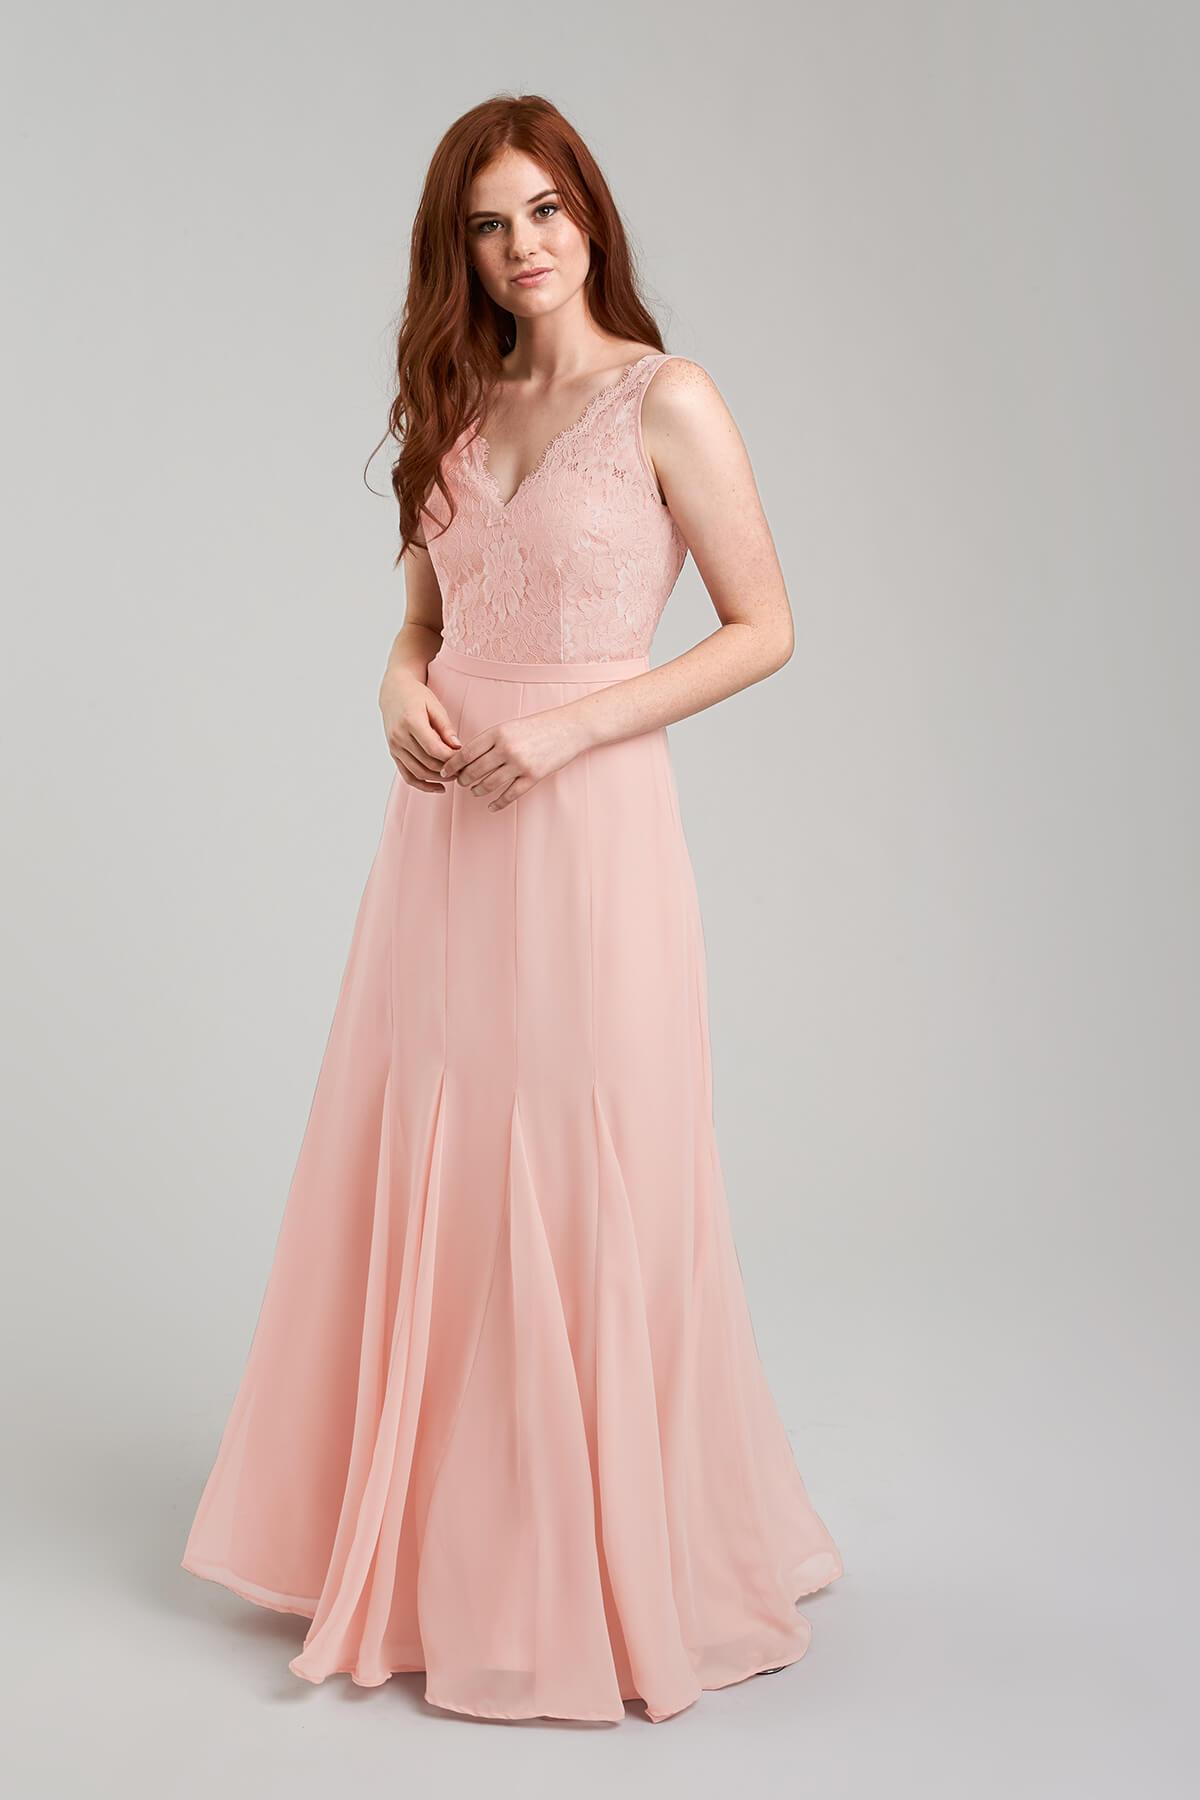 V-Neck Floor-Length Bridesmaid Dress   Bycouturier